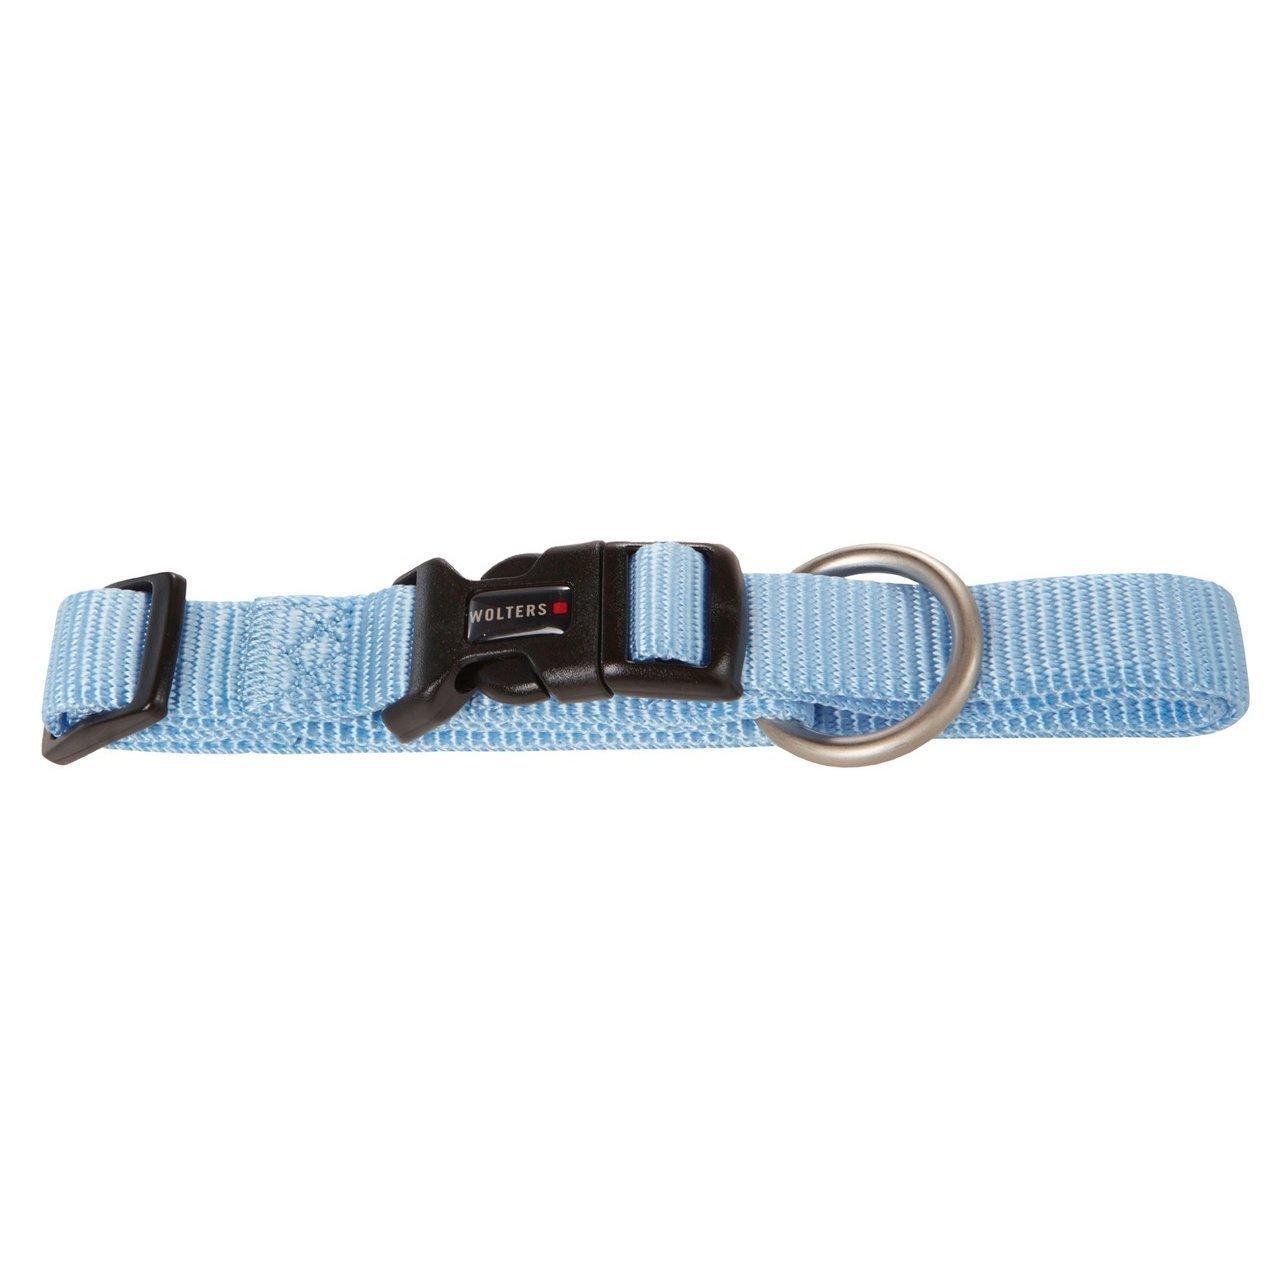 Wolters Halsband Extra Breit Professional Nylon, Bild 9